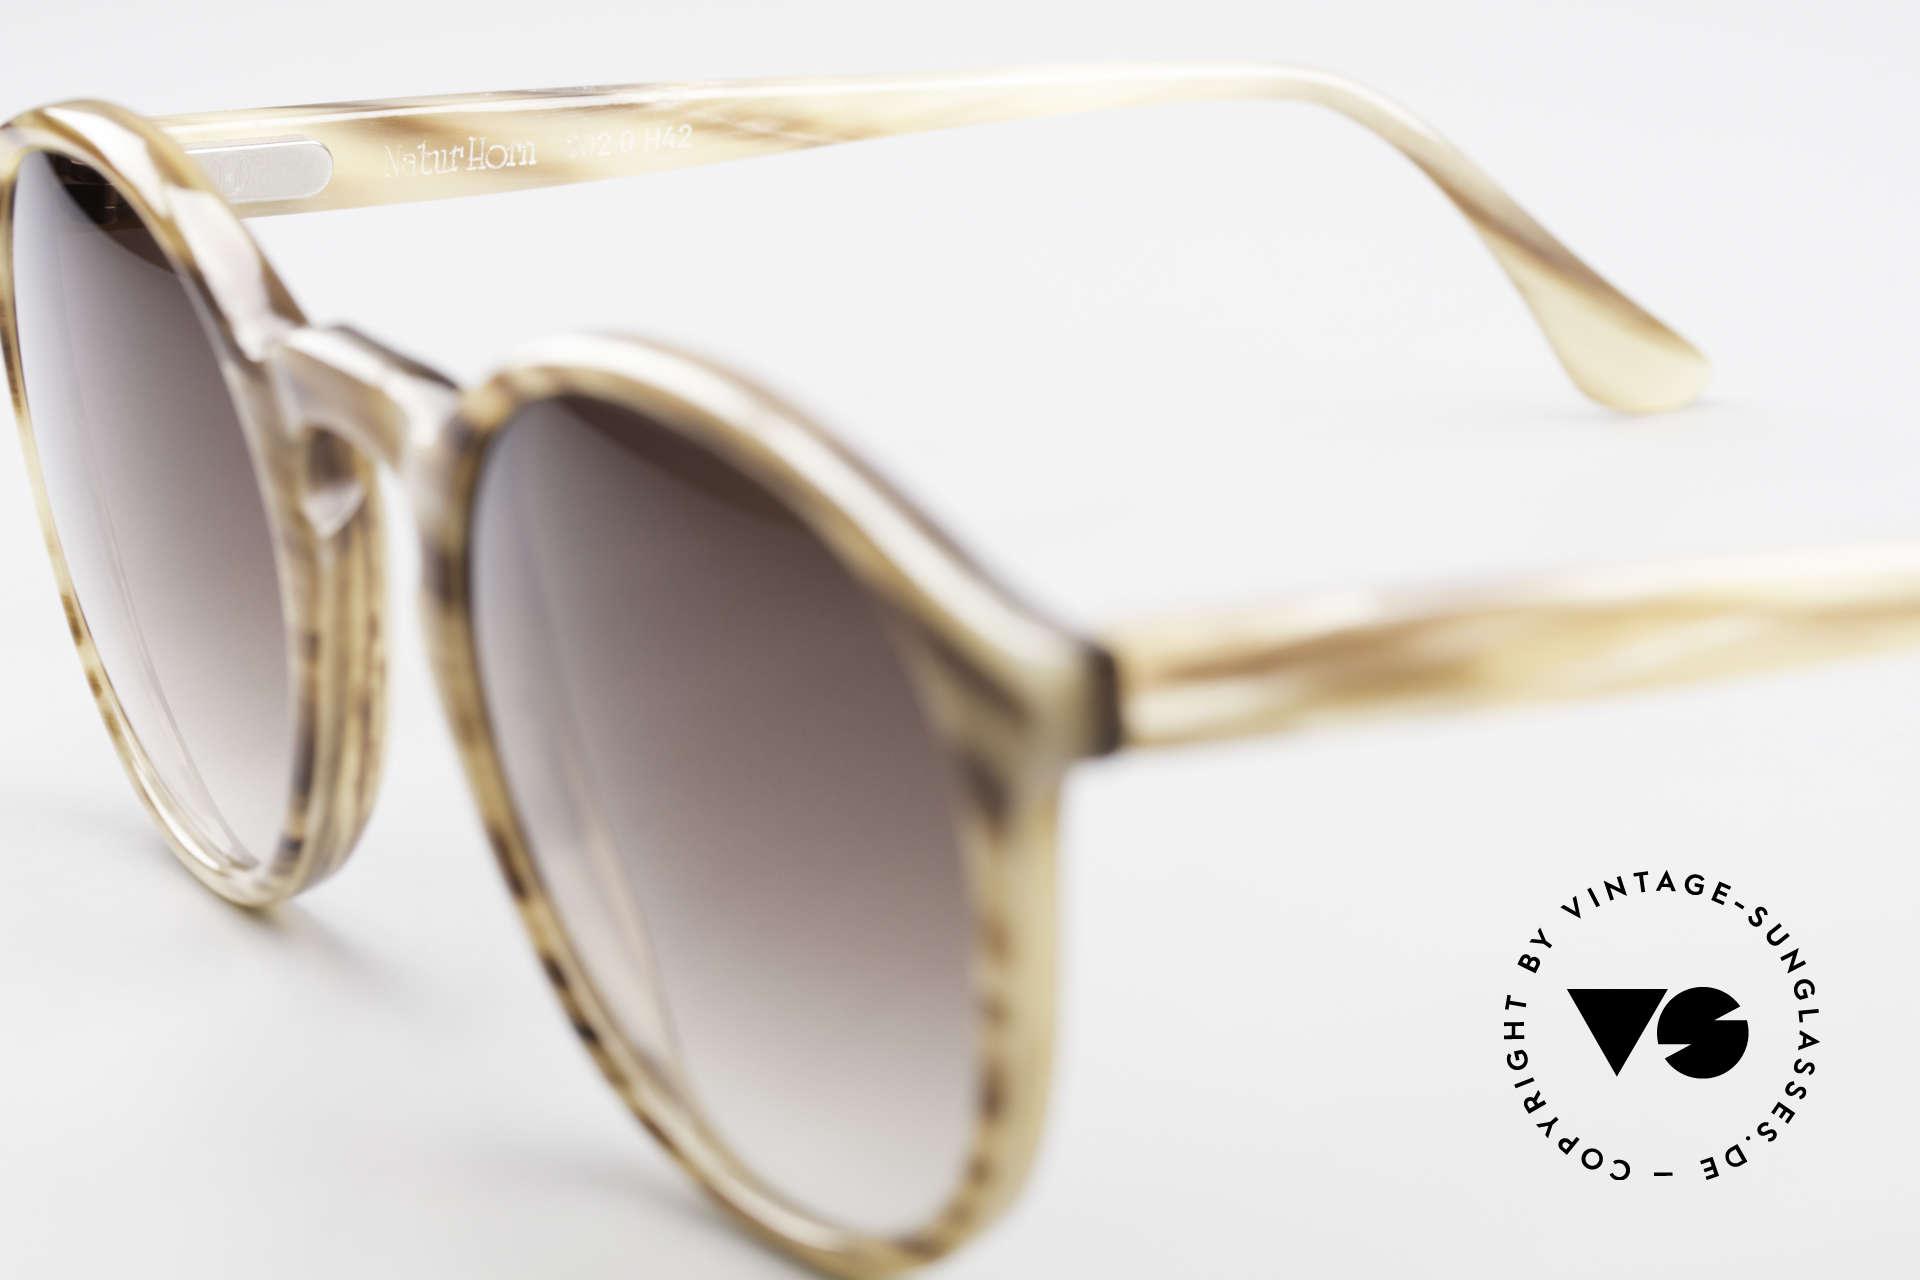 Hartmanns H42 Horn Johnny Depp Style Sunglasses, unworn (like all our vintage gentlemen's sunglasses), Made for Men